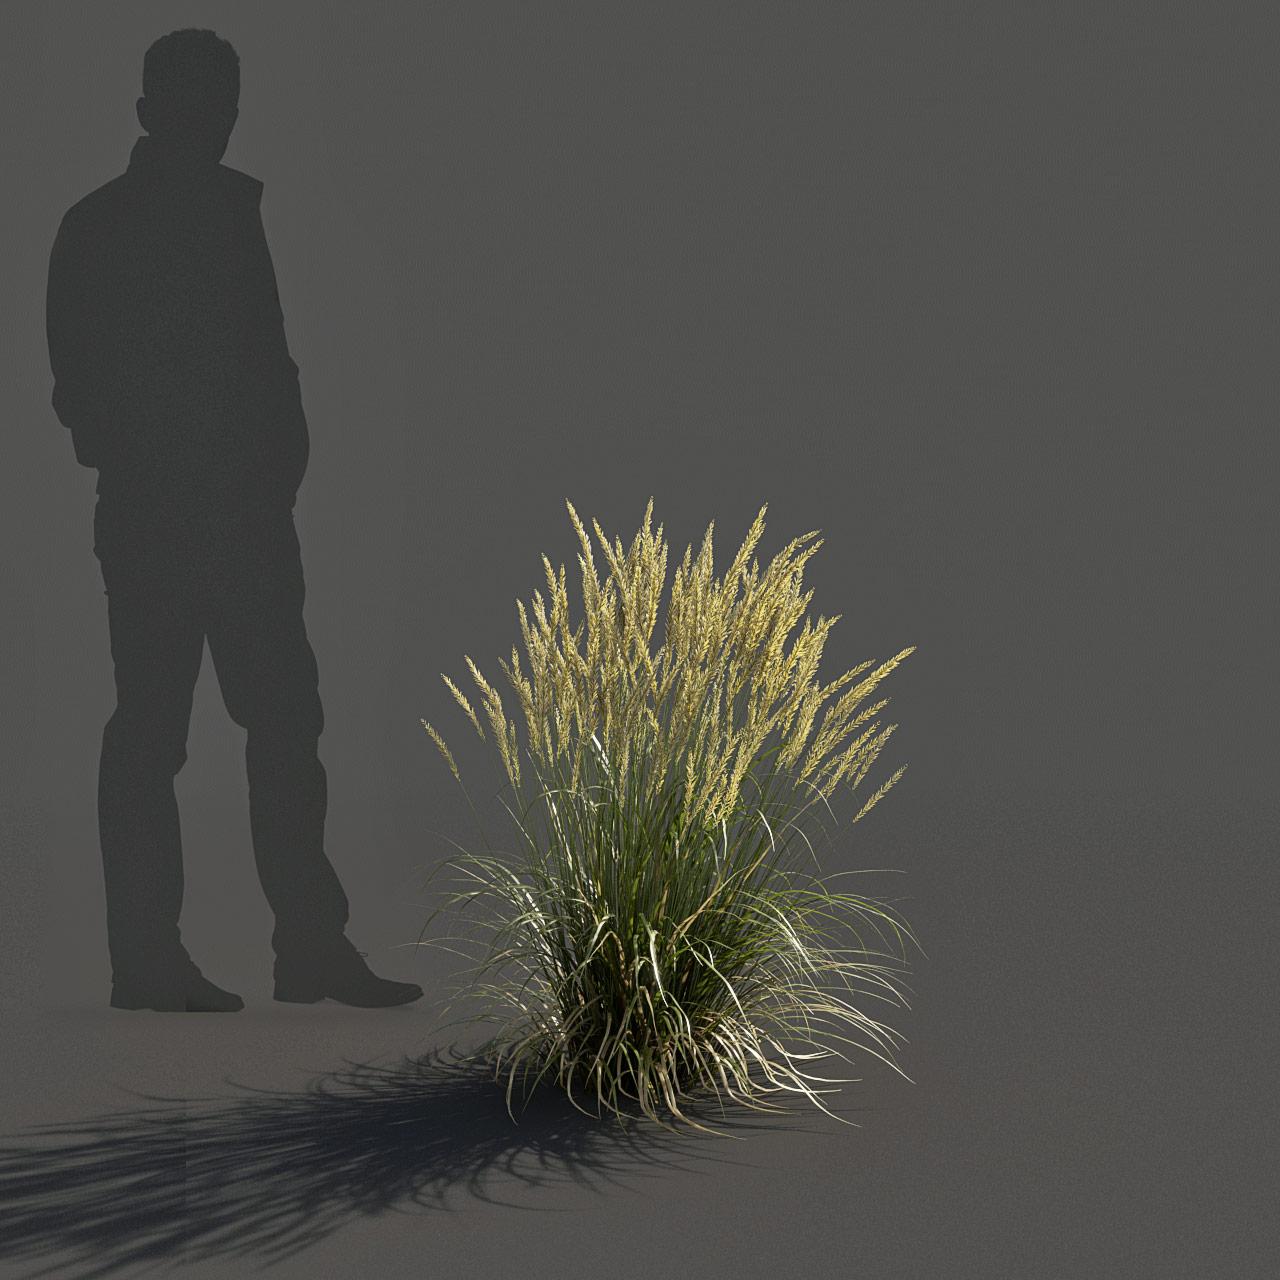 Feather Reed Grass 3D model low_v01 -  'Karl Foerster' - Calamagrostis acutiflora